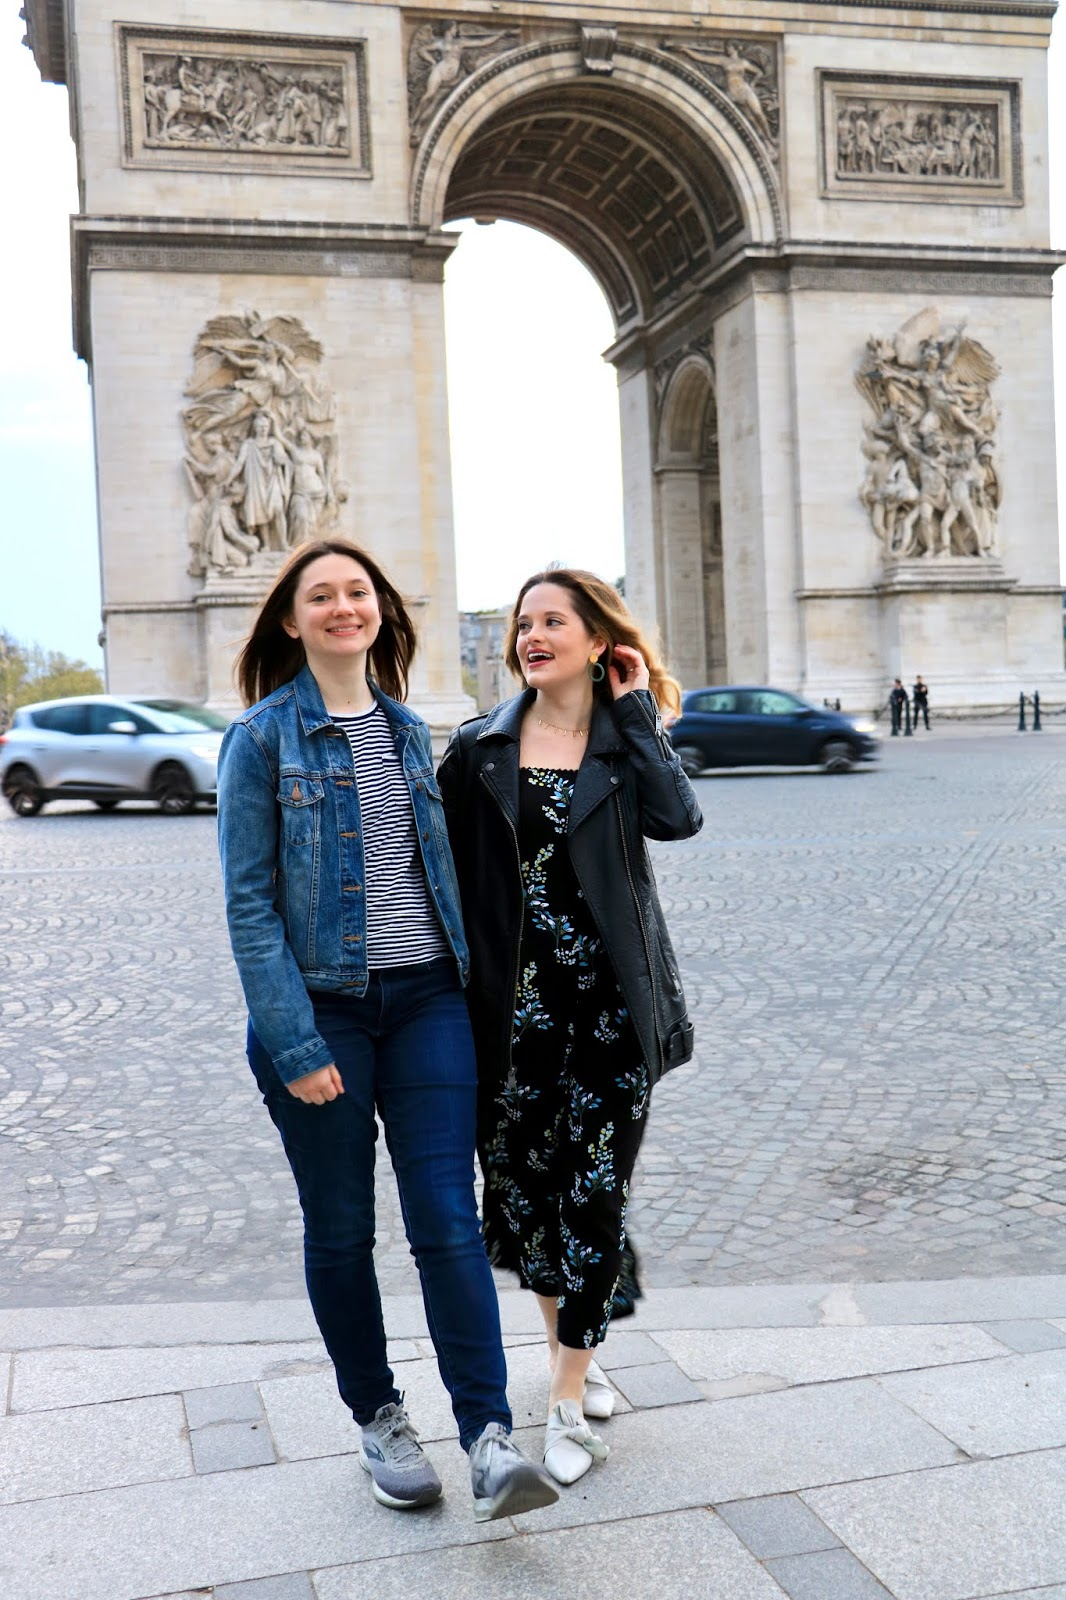 Paris spring travel guide blogger